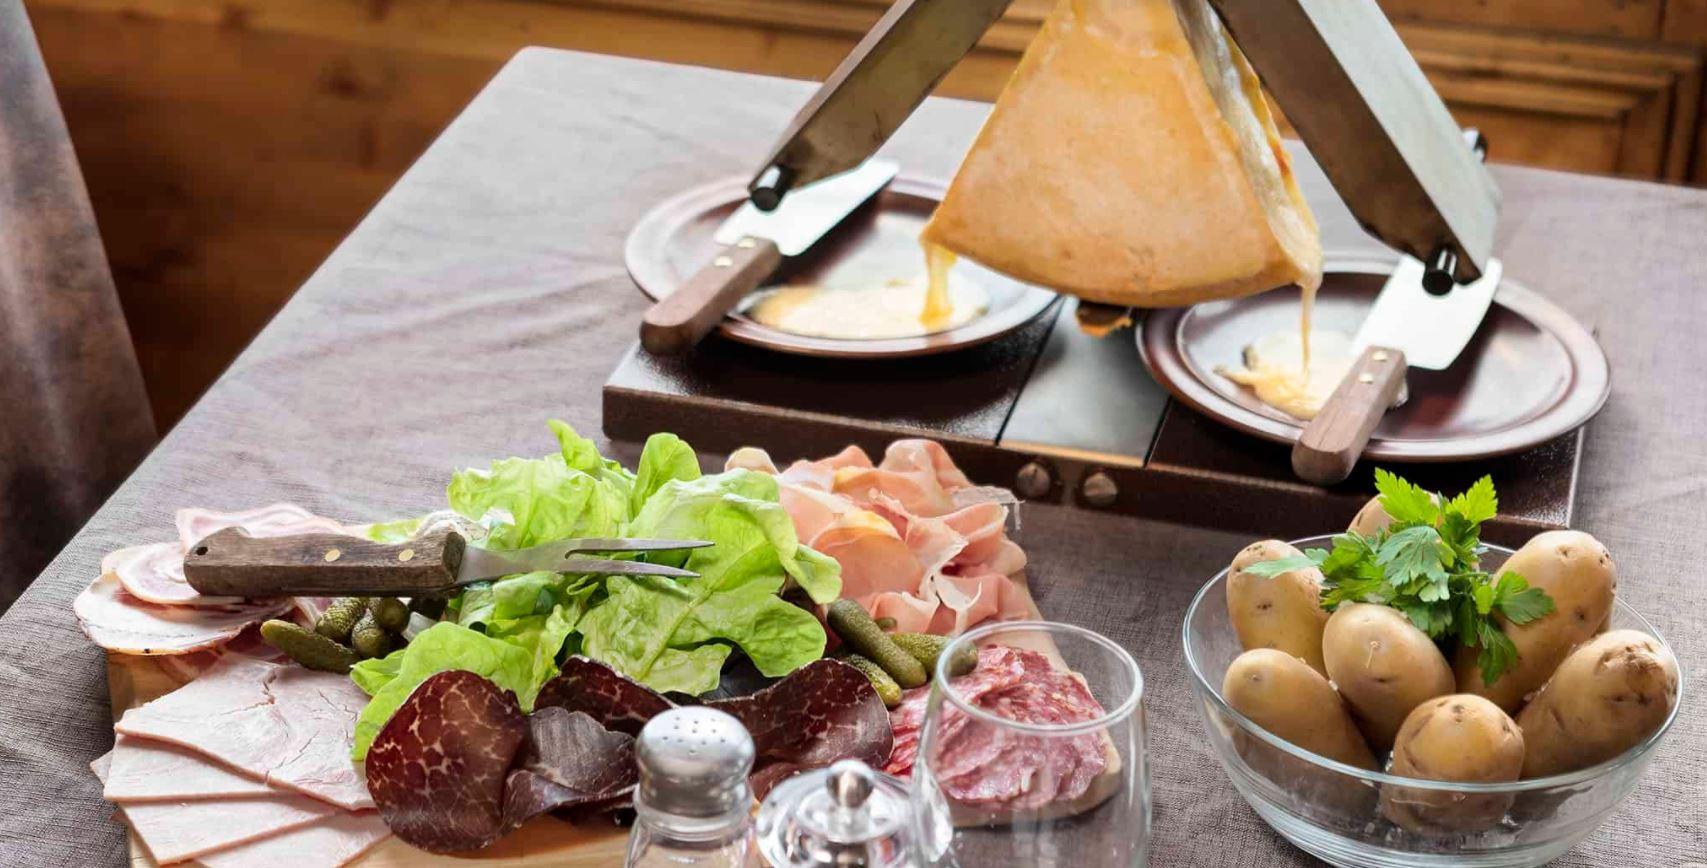 Picture of a Raclette meal at the restaurant of Les Balcons de Belle Plagne